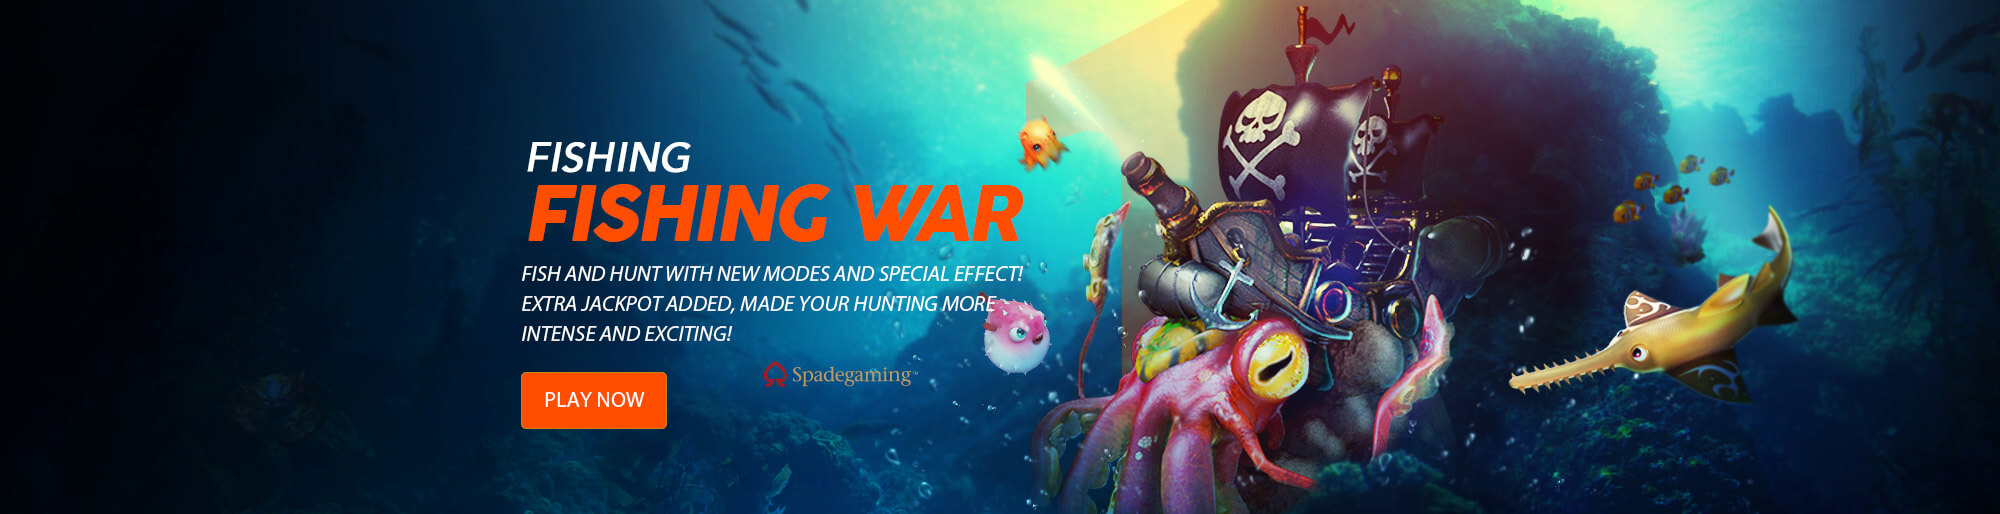 Fishing Online Betting Malaysia